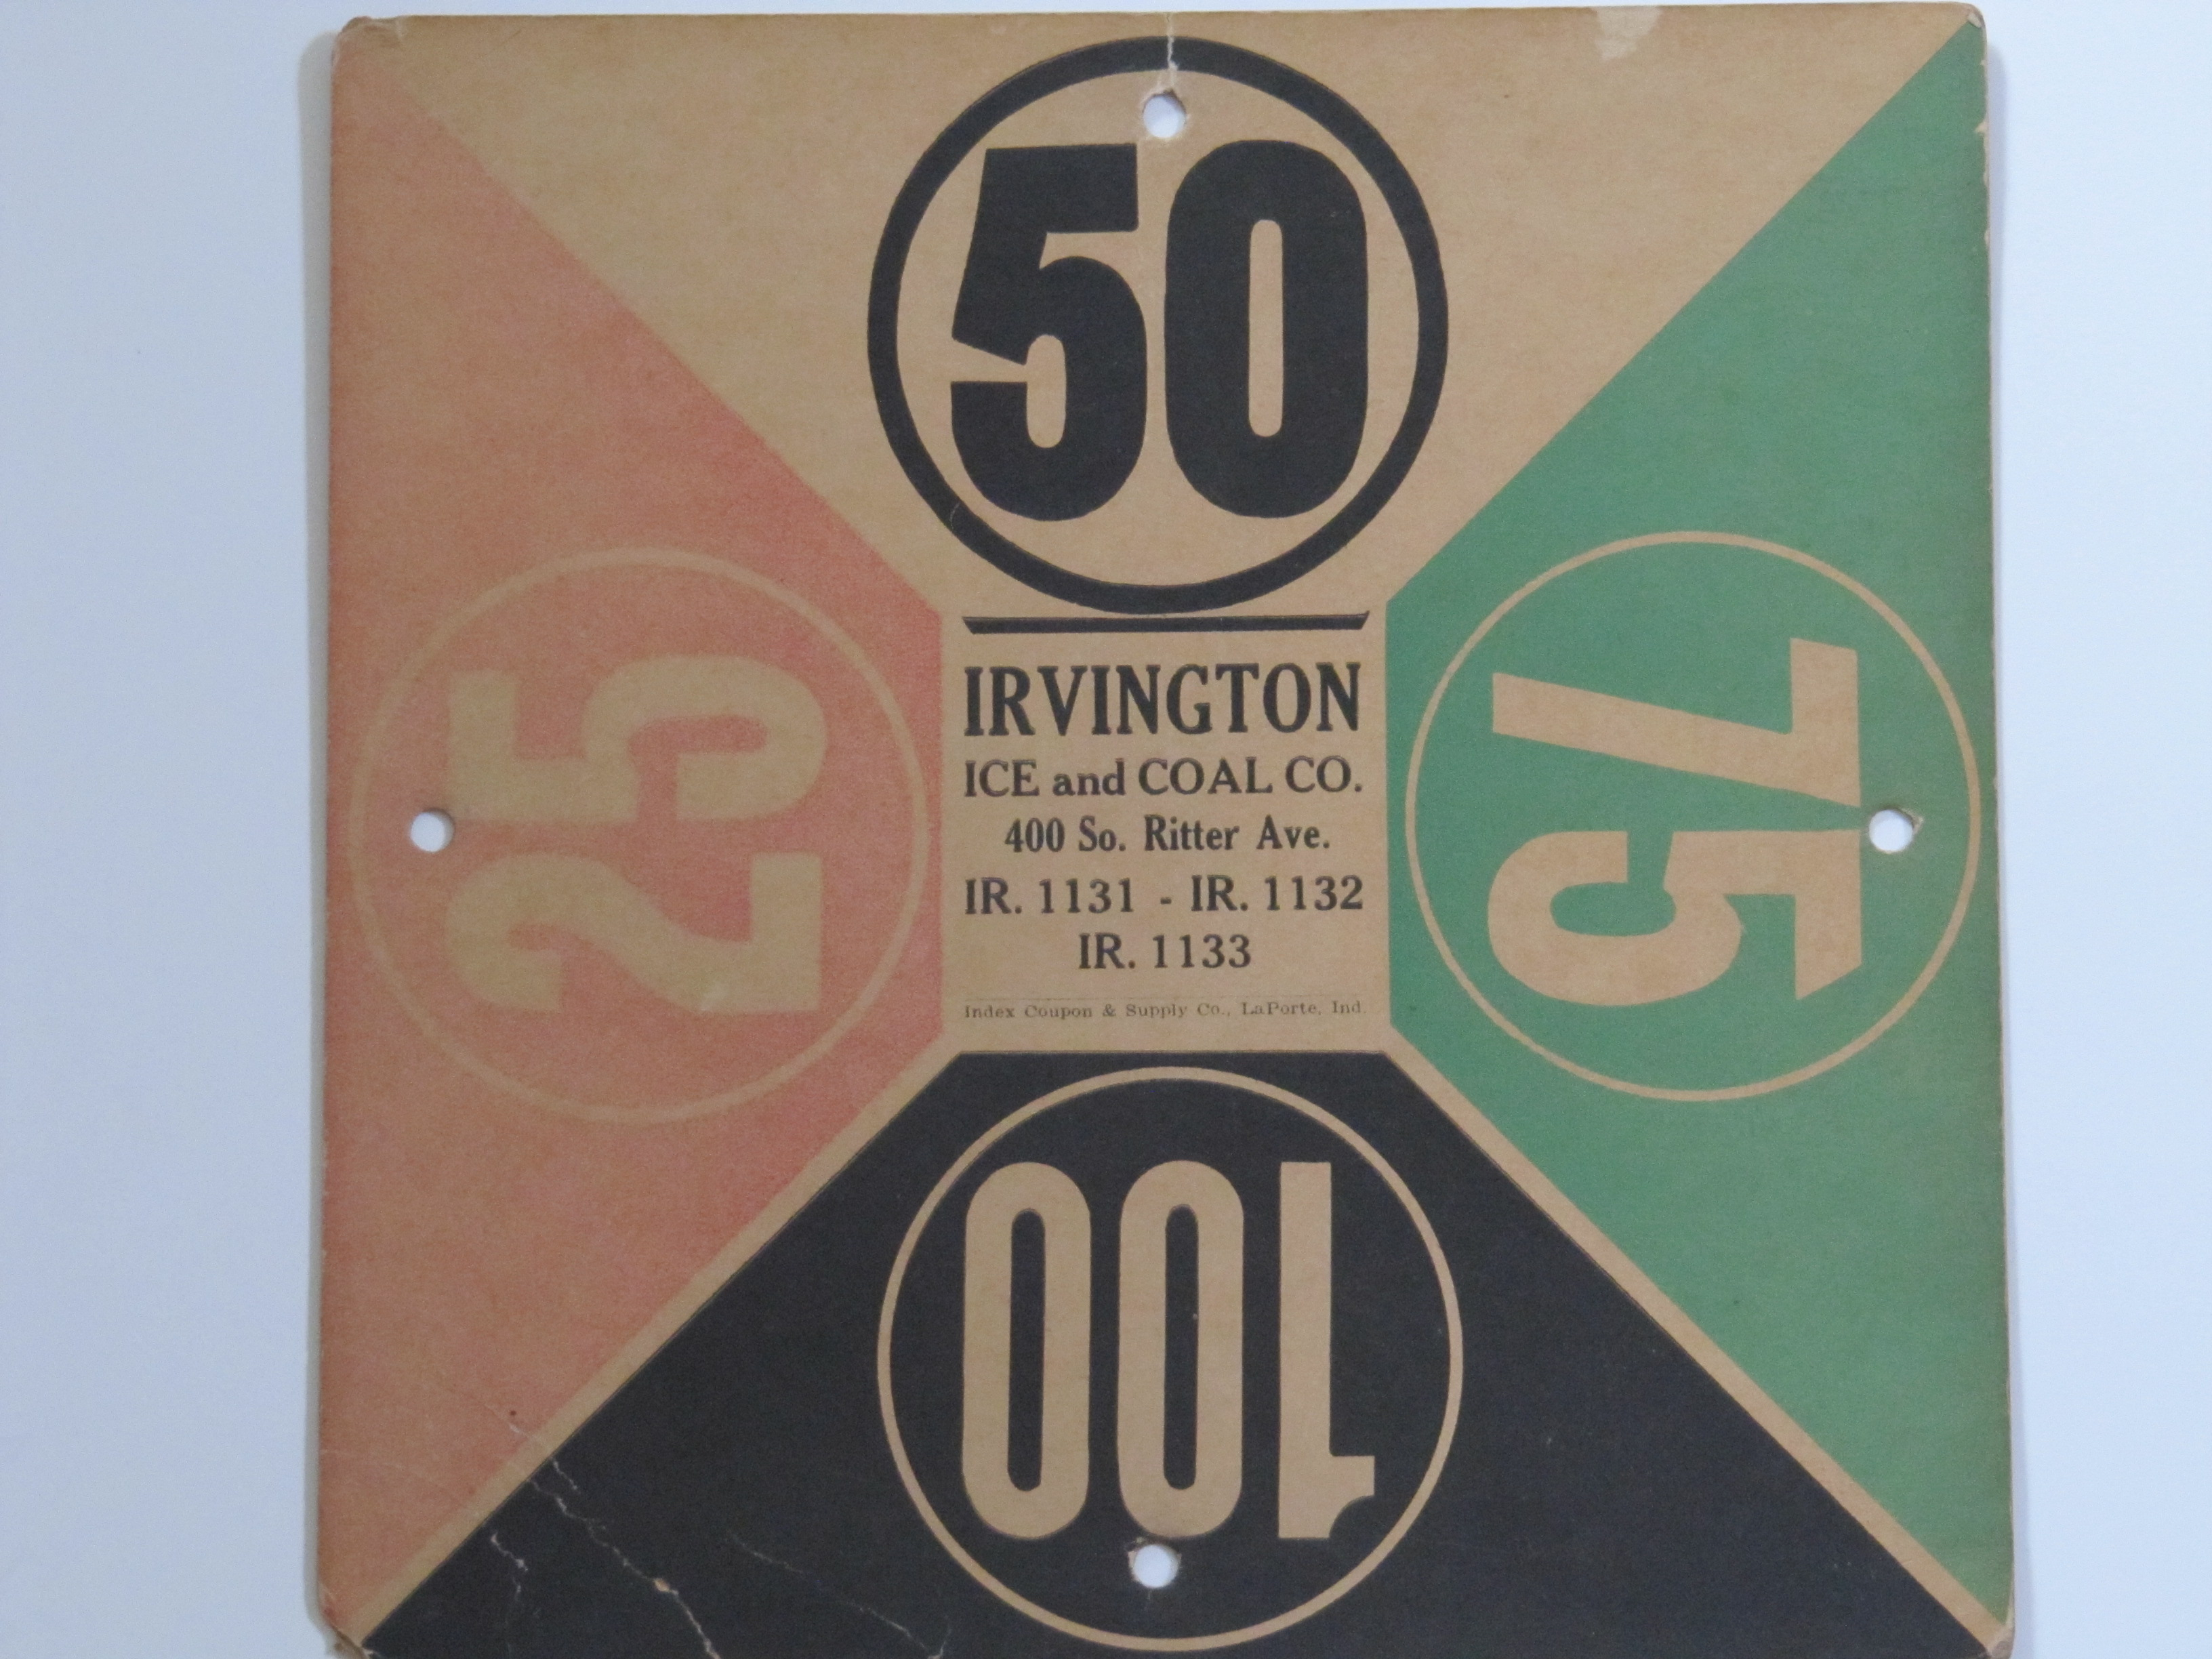 Irvington Ice & Coal Co.